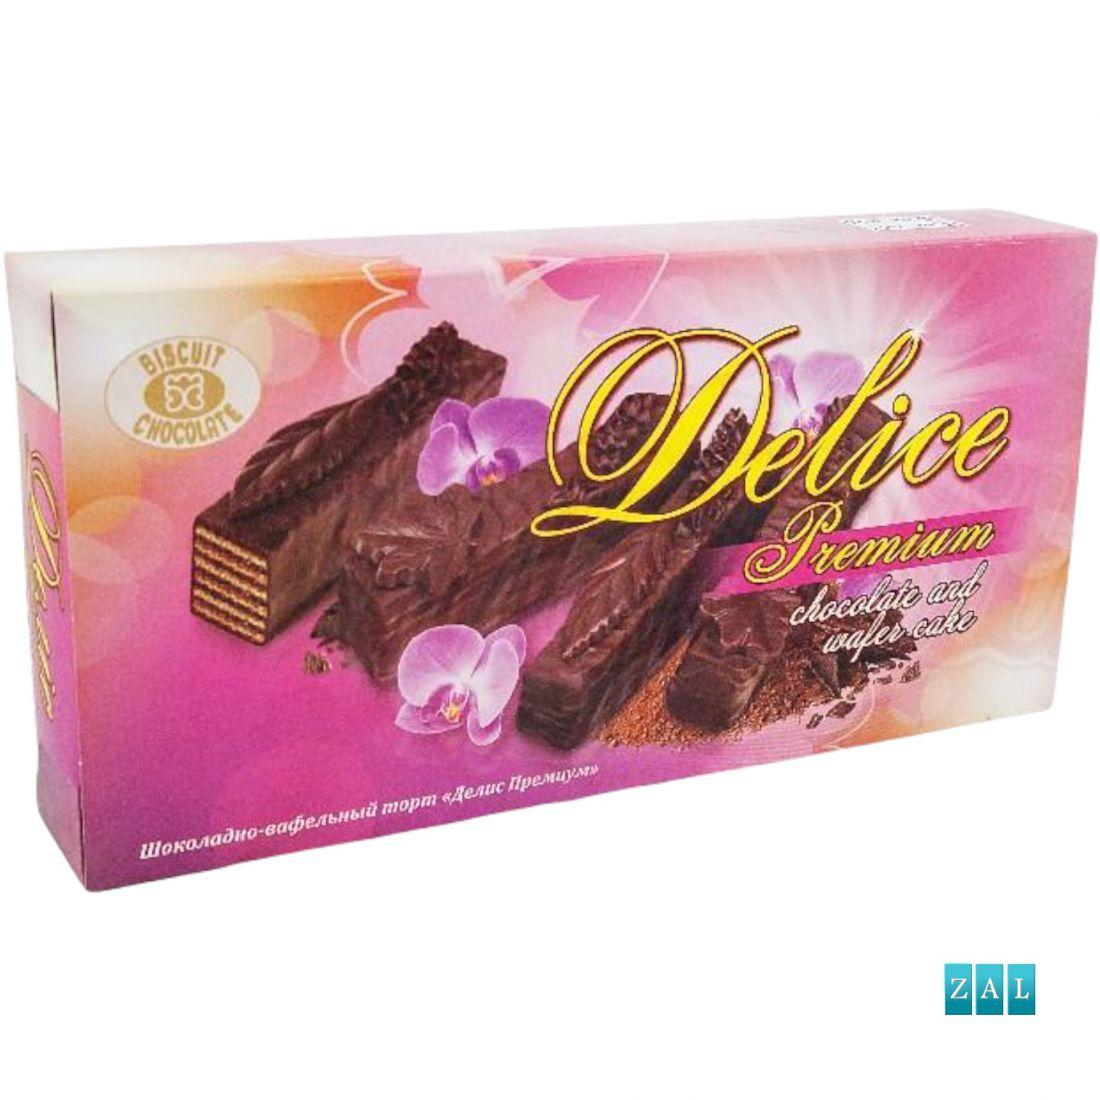 Delice prémium csokoládé ostyatorta 500g